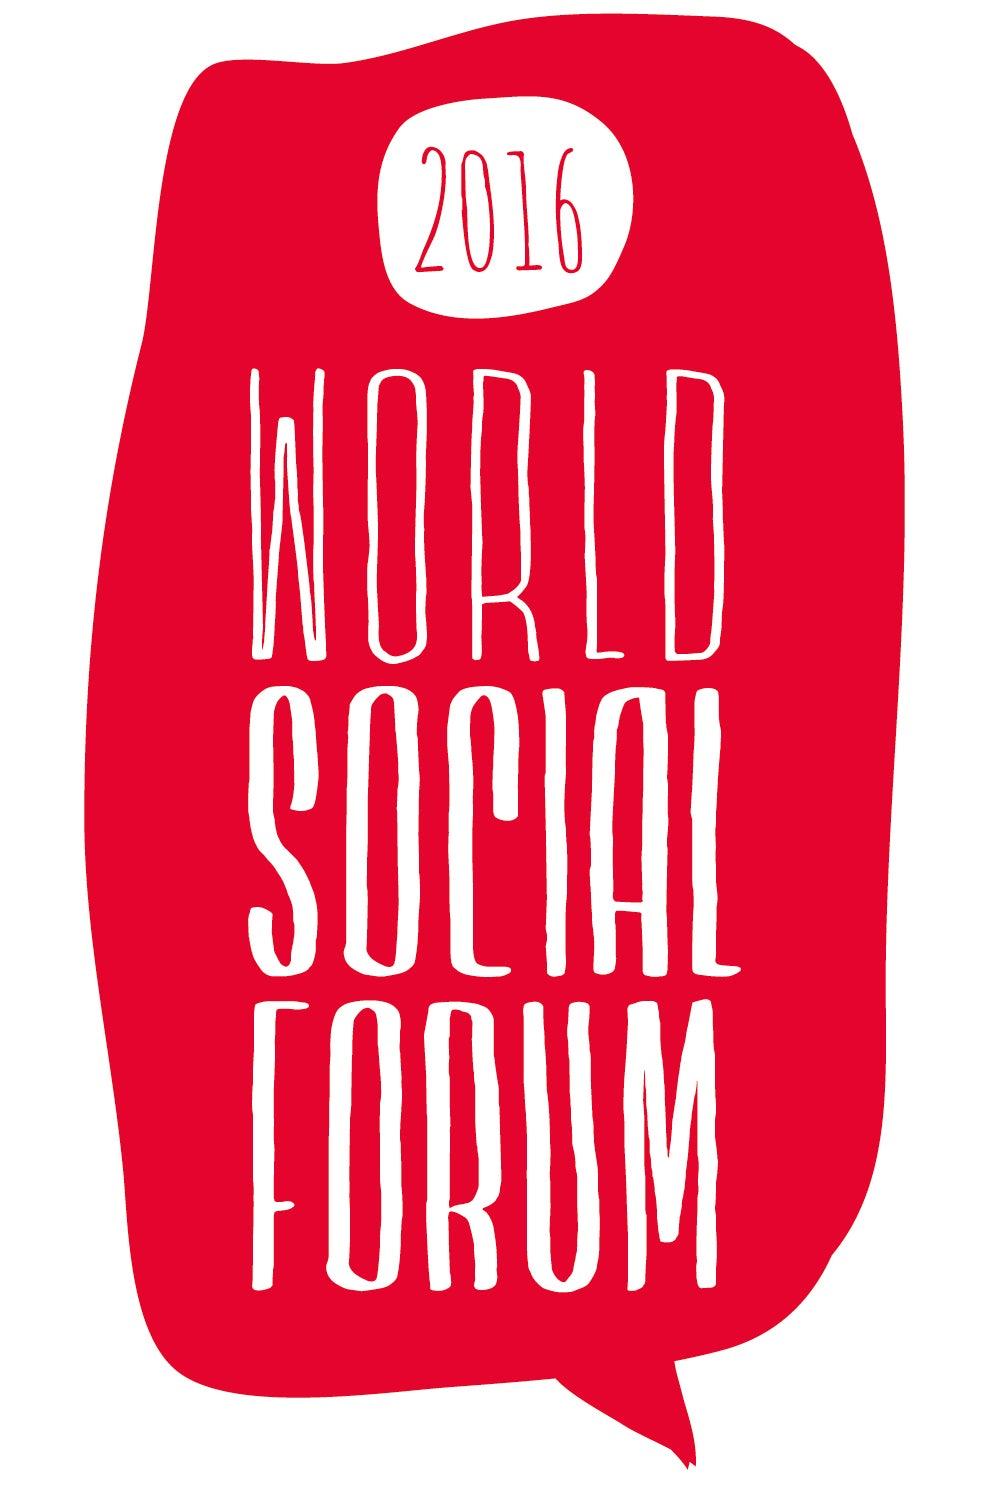 World social forum  logo